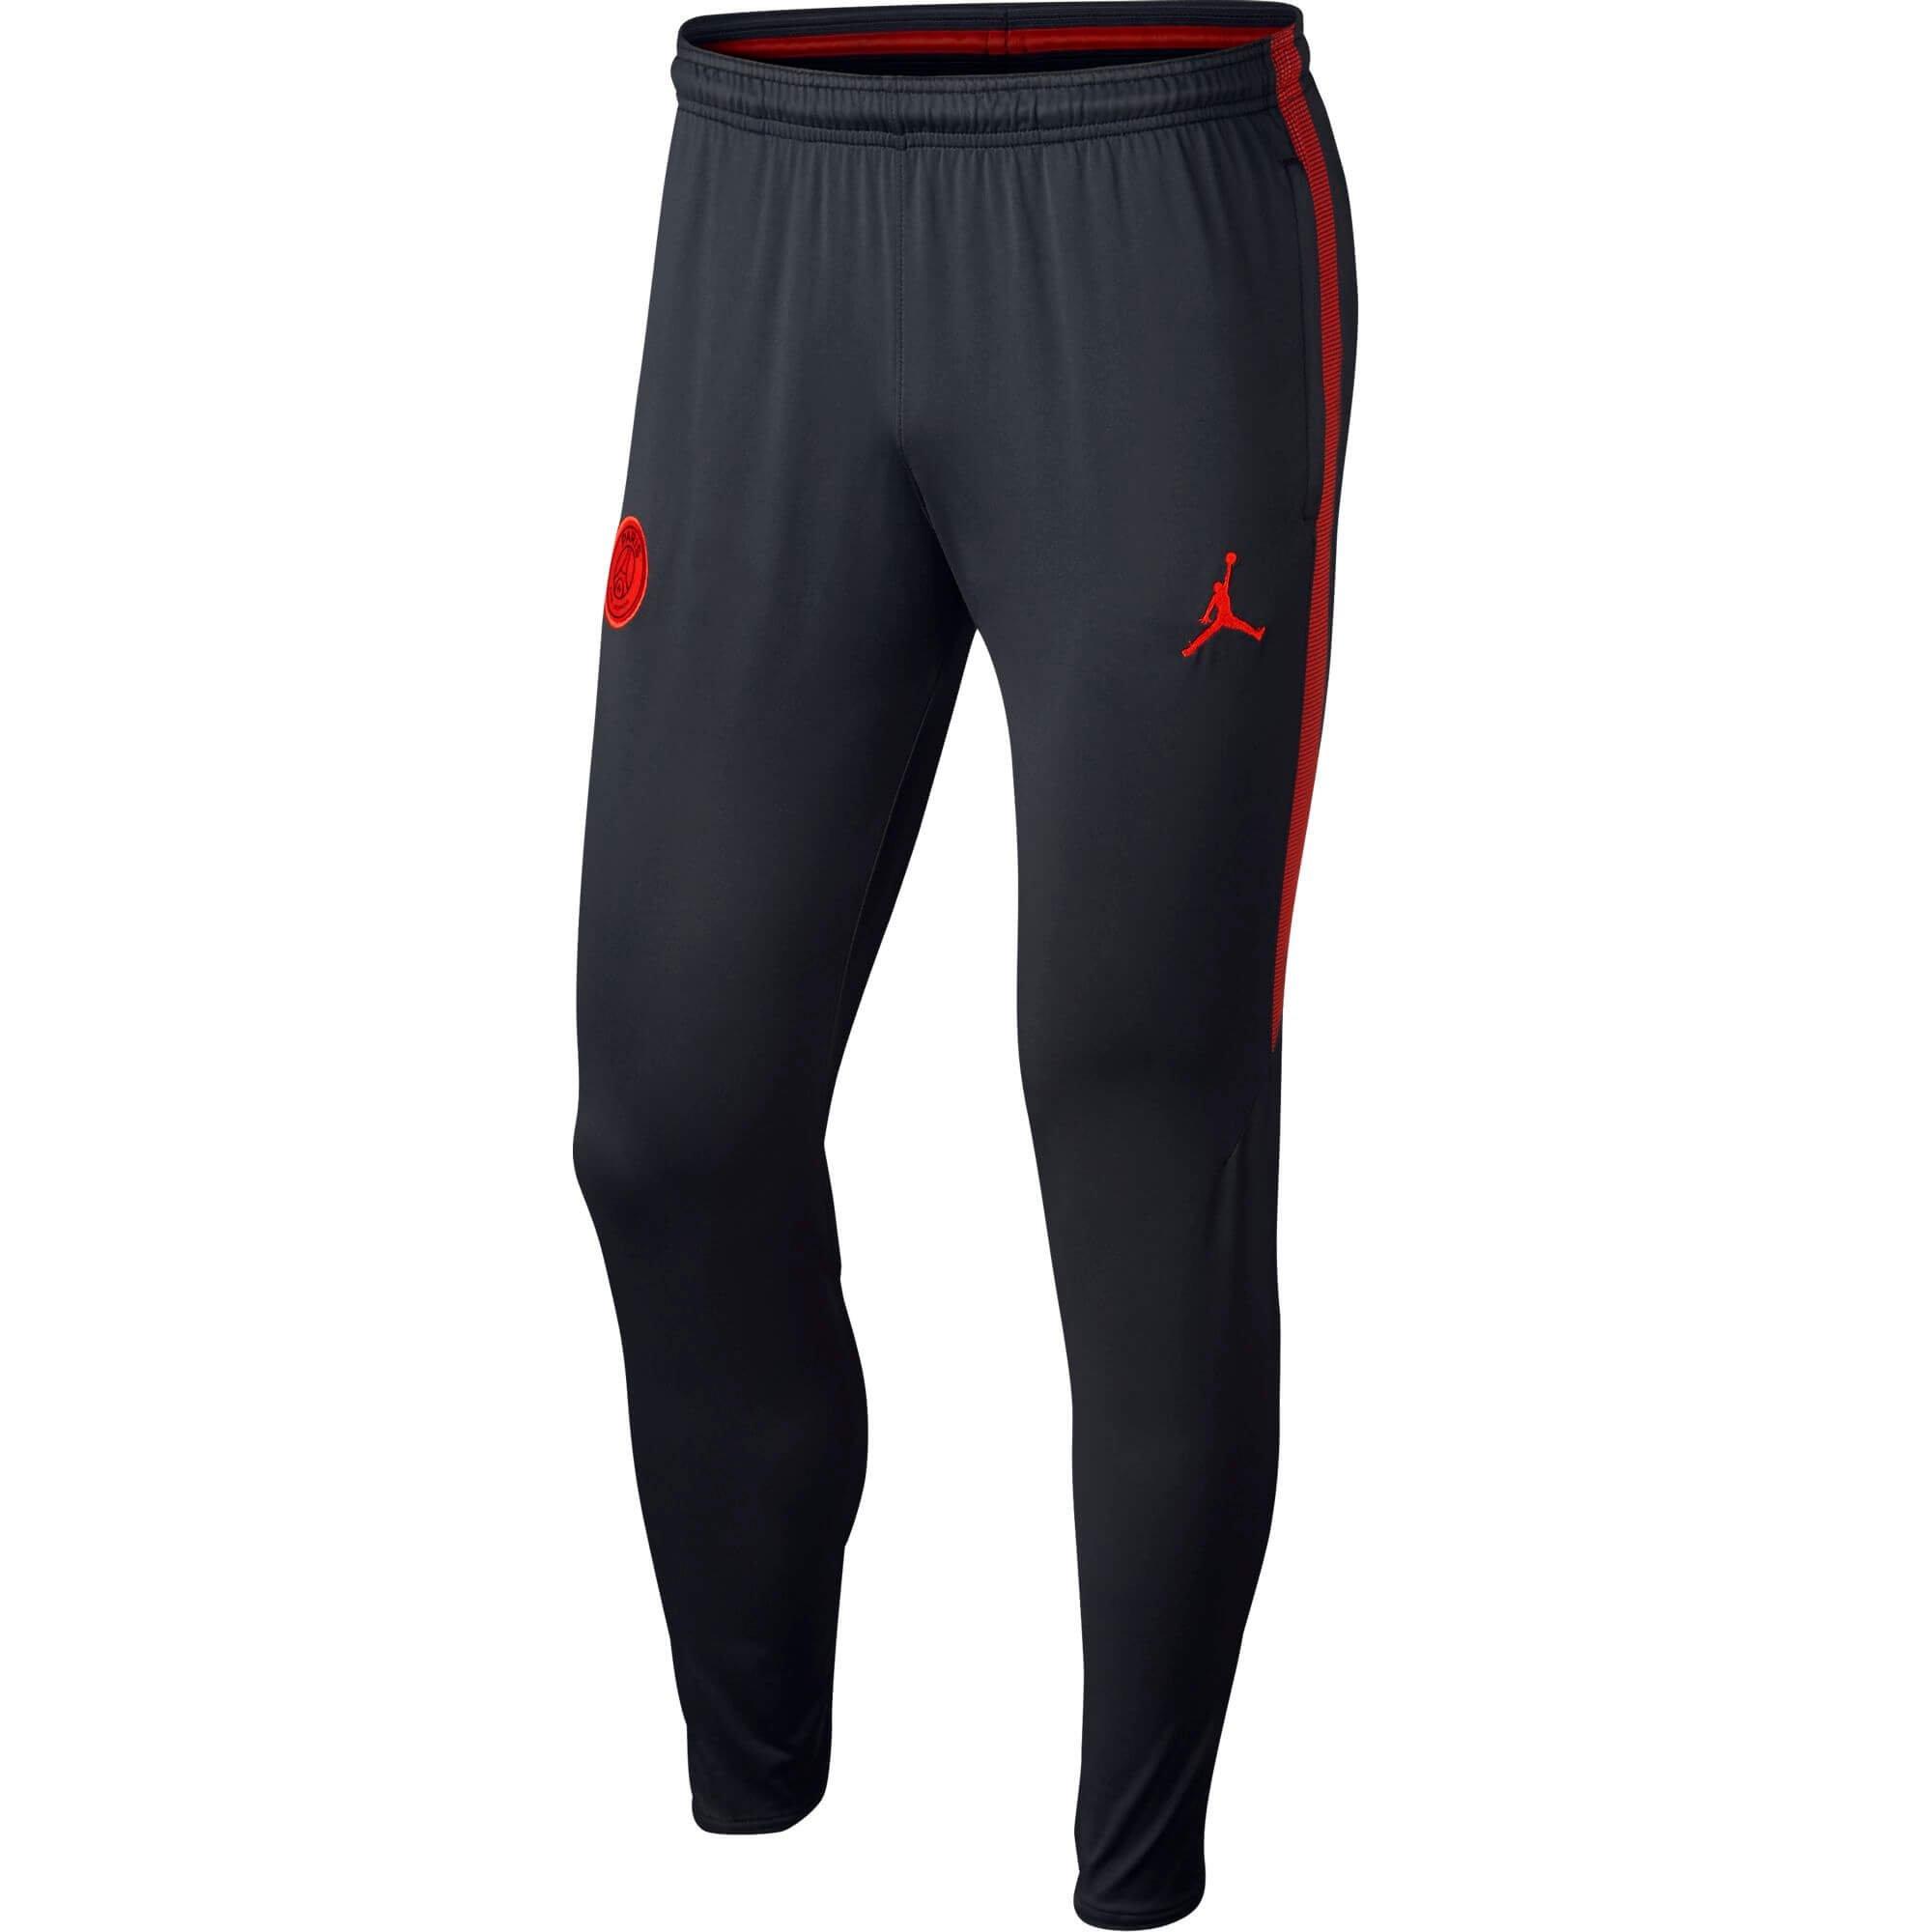 Aq0958 Jordan Pantalon 021 20182019 Noirrouge Nike Entrainement Psg xRqwOtvY